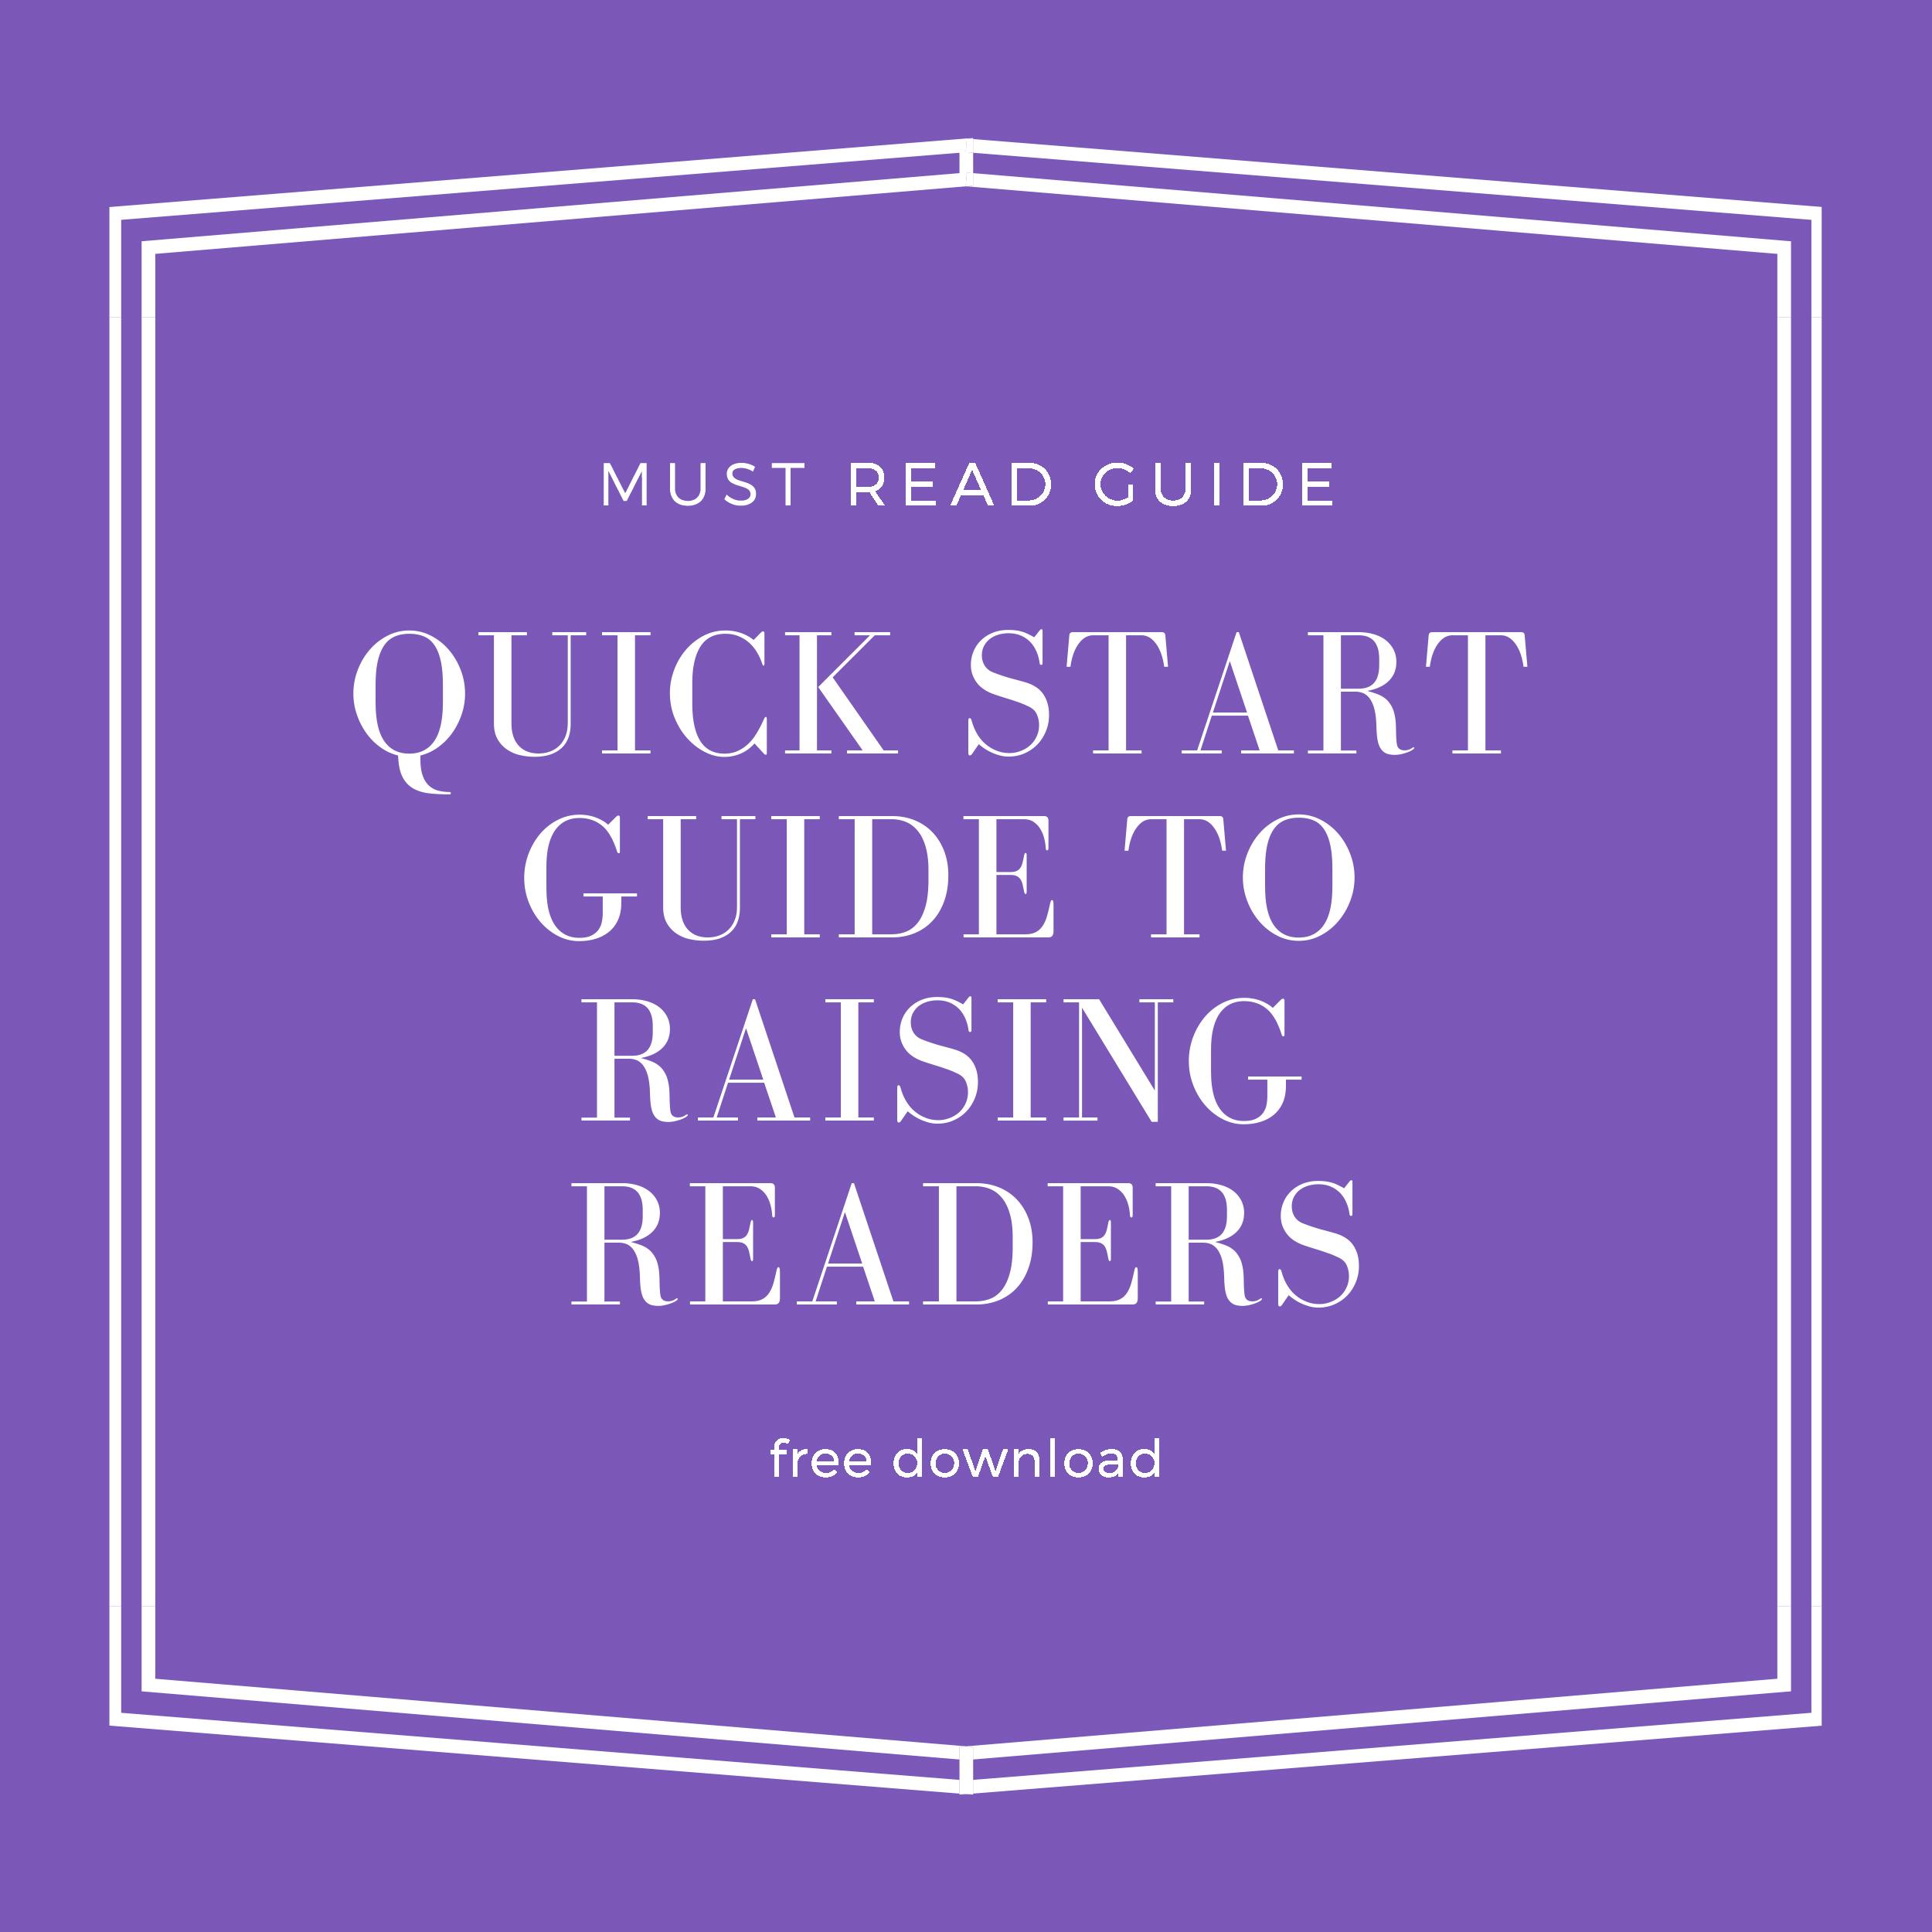 raisingreaders.jpg